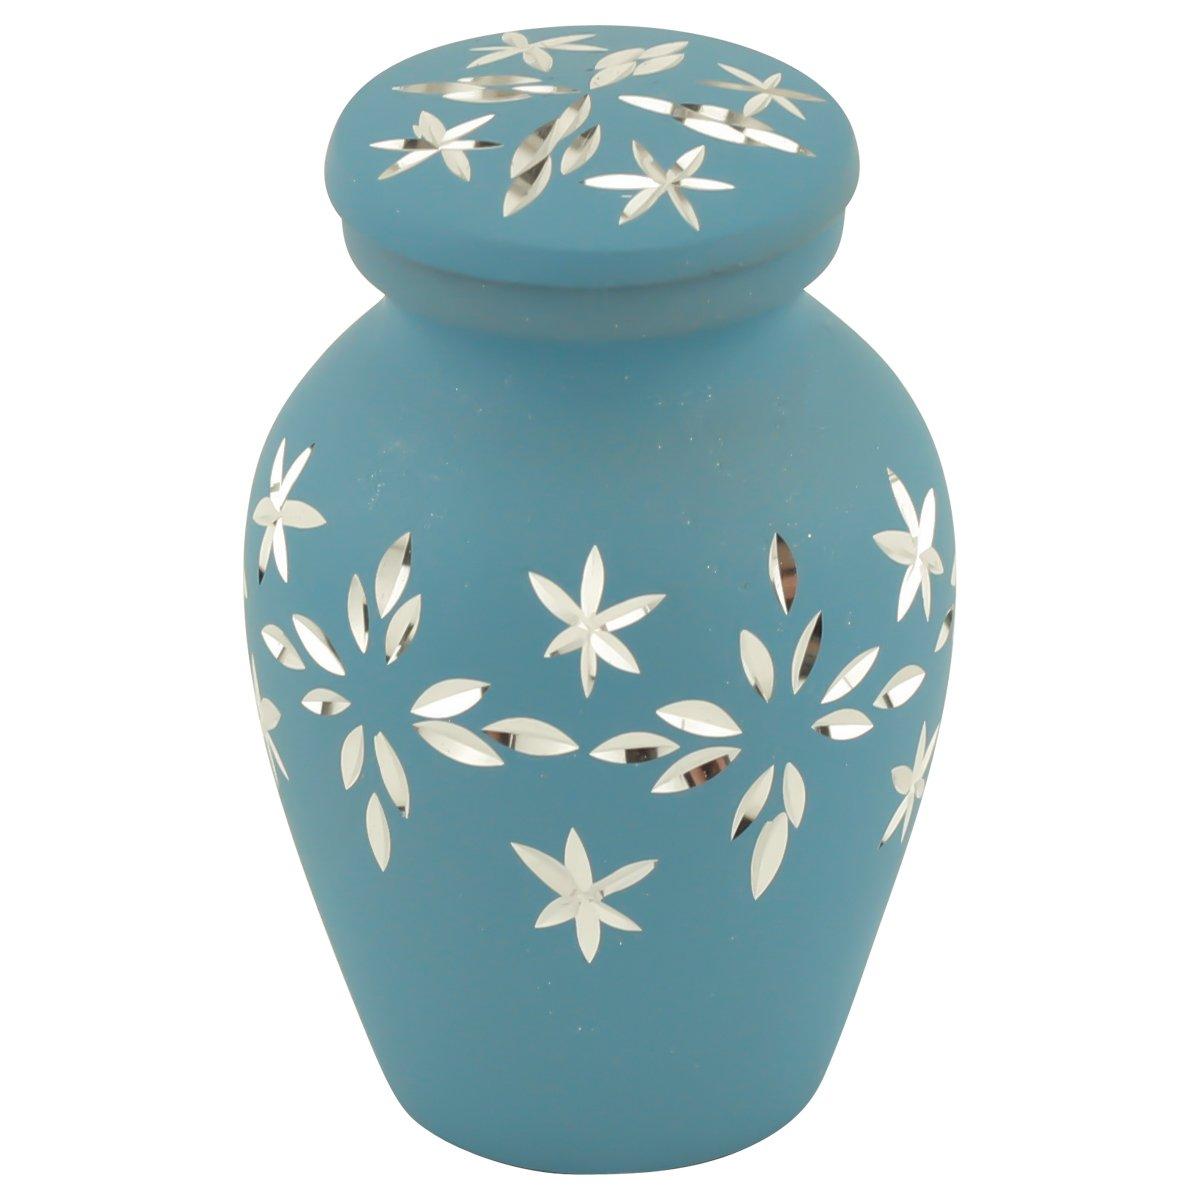 Silverlight Urns Mercury Leaves Keepsake Urn, Mini Urn for Ashes, Autumn Leaf Pattern in Grey, Multi-Color, 2.75 Inches High MAF-319K